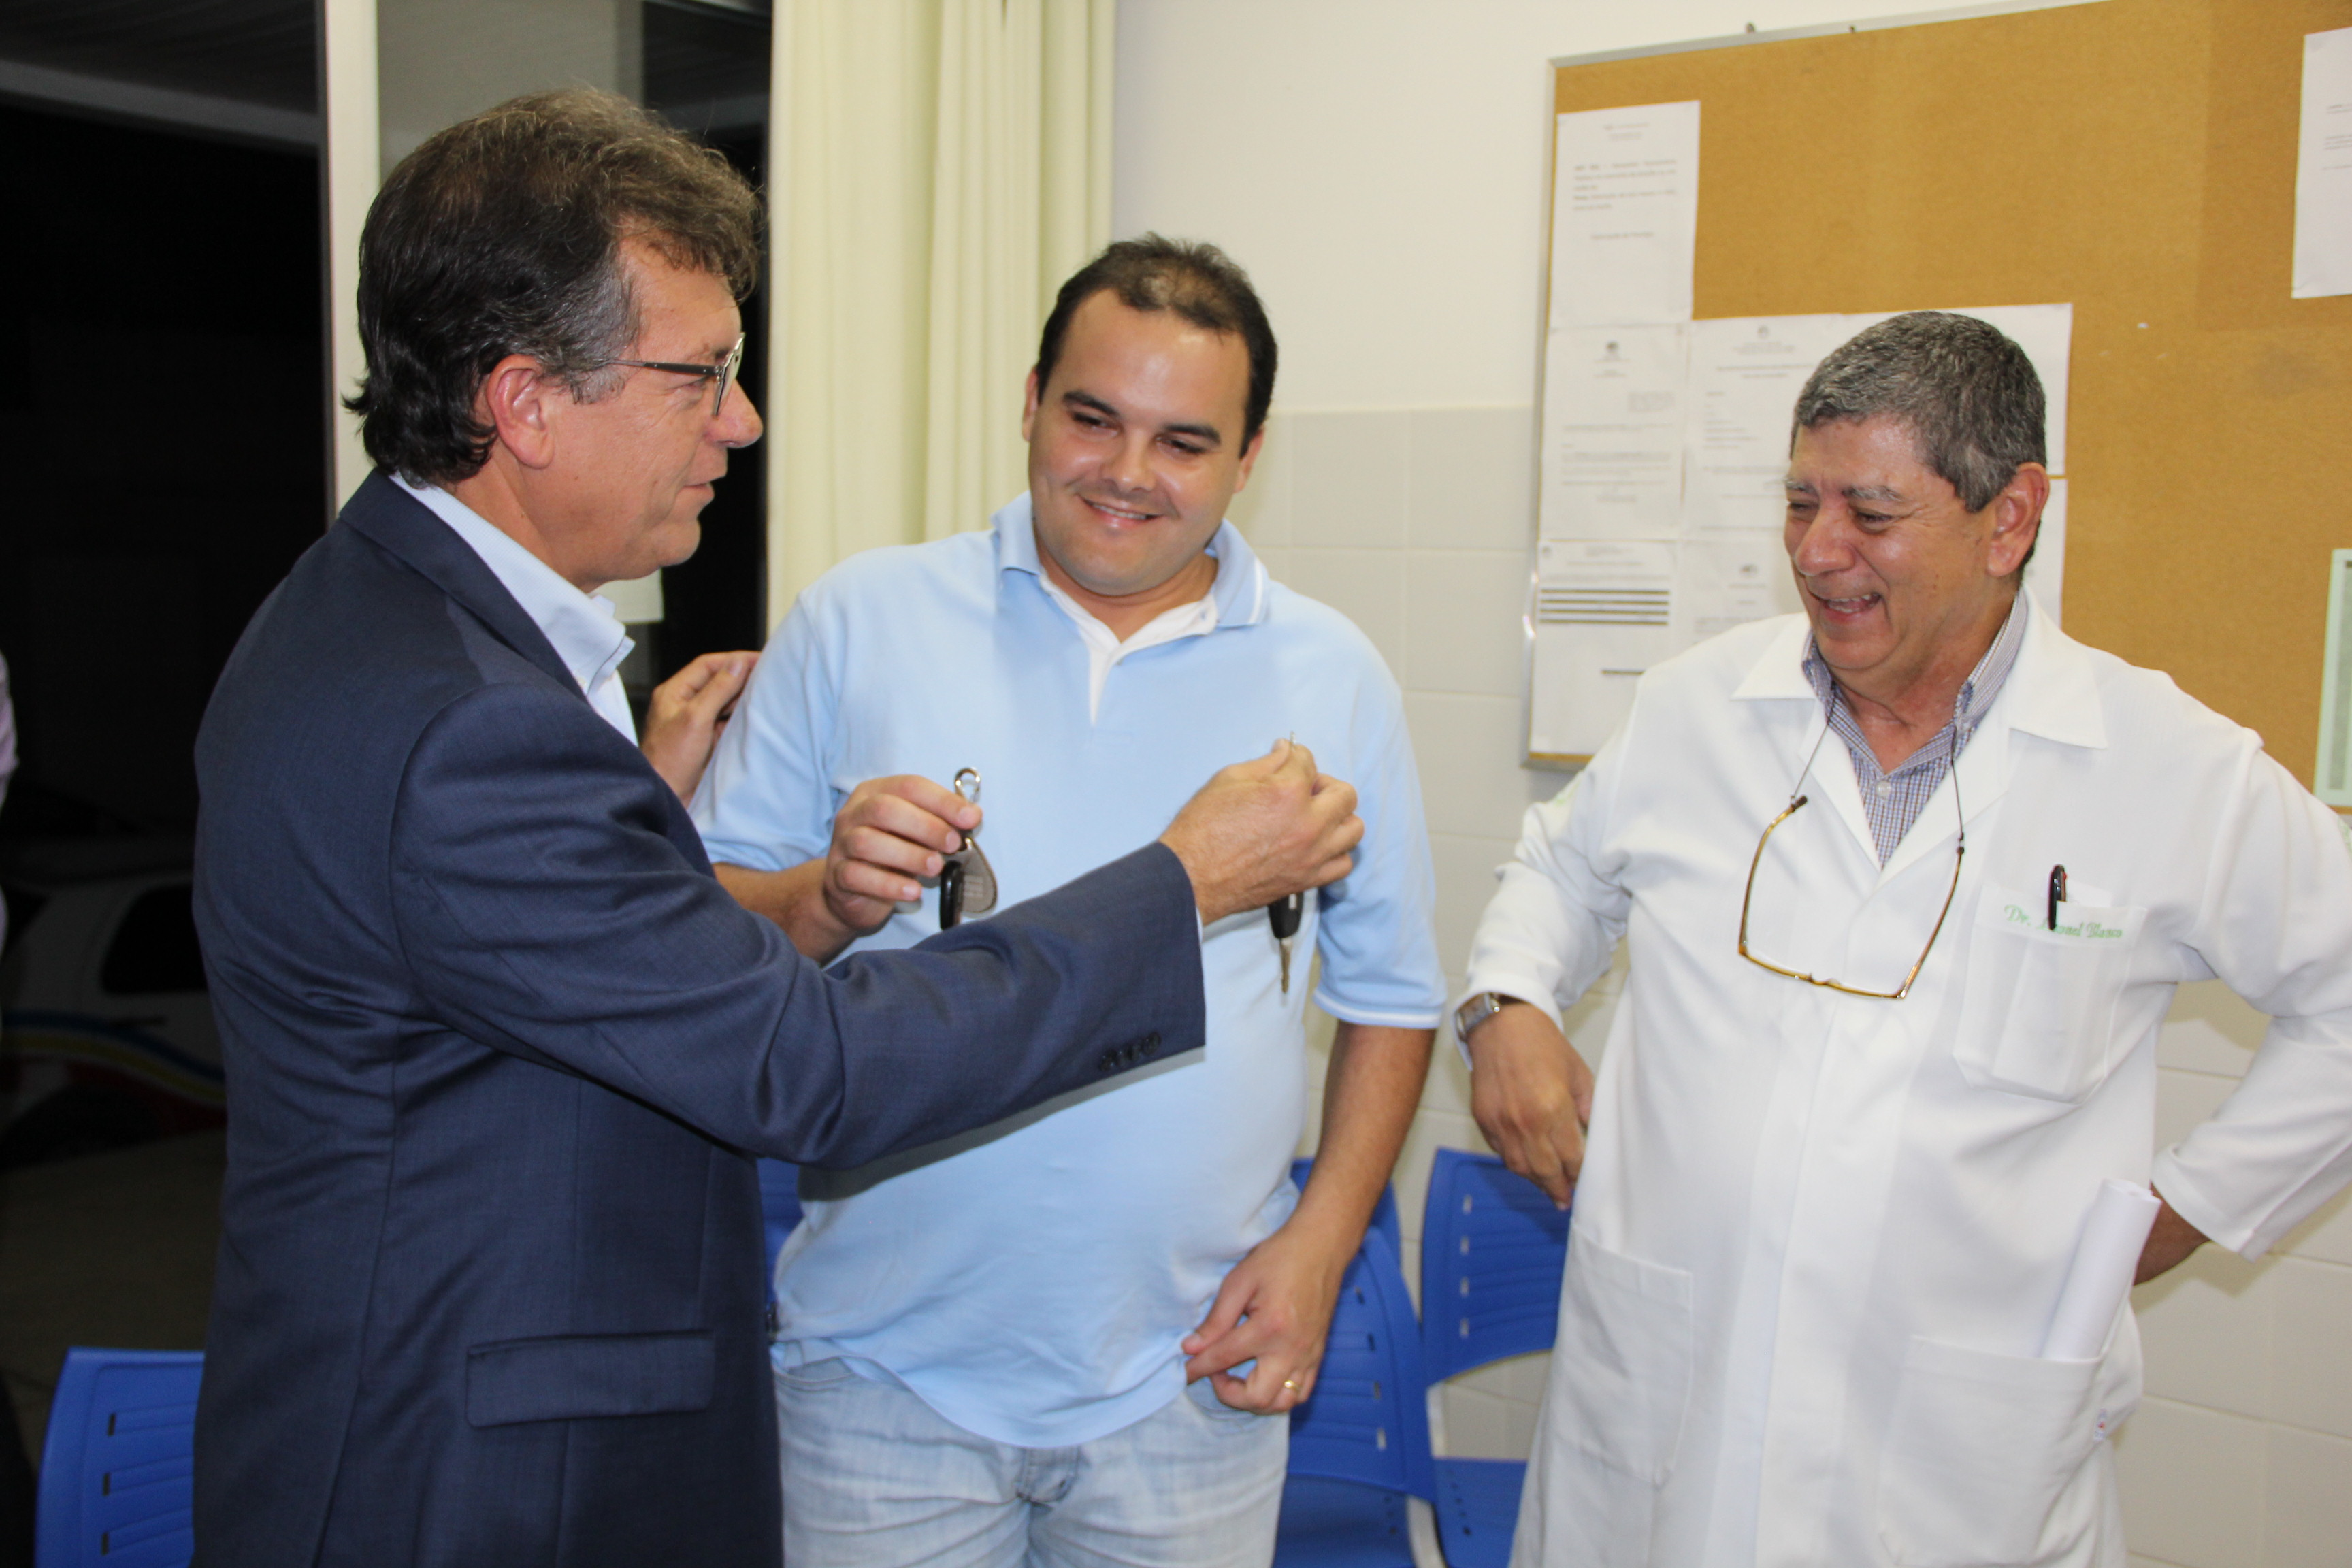 Emenda de Laércio Oliveira garante compra de  equipamentos para Postos de saúde de Carira